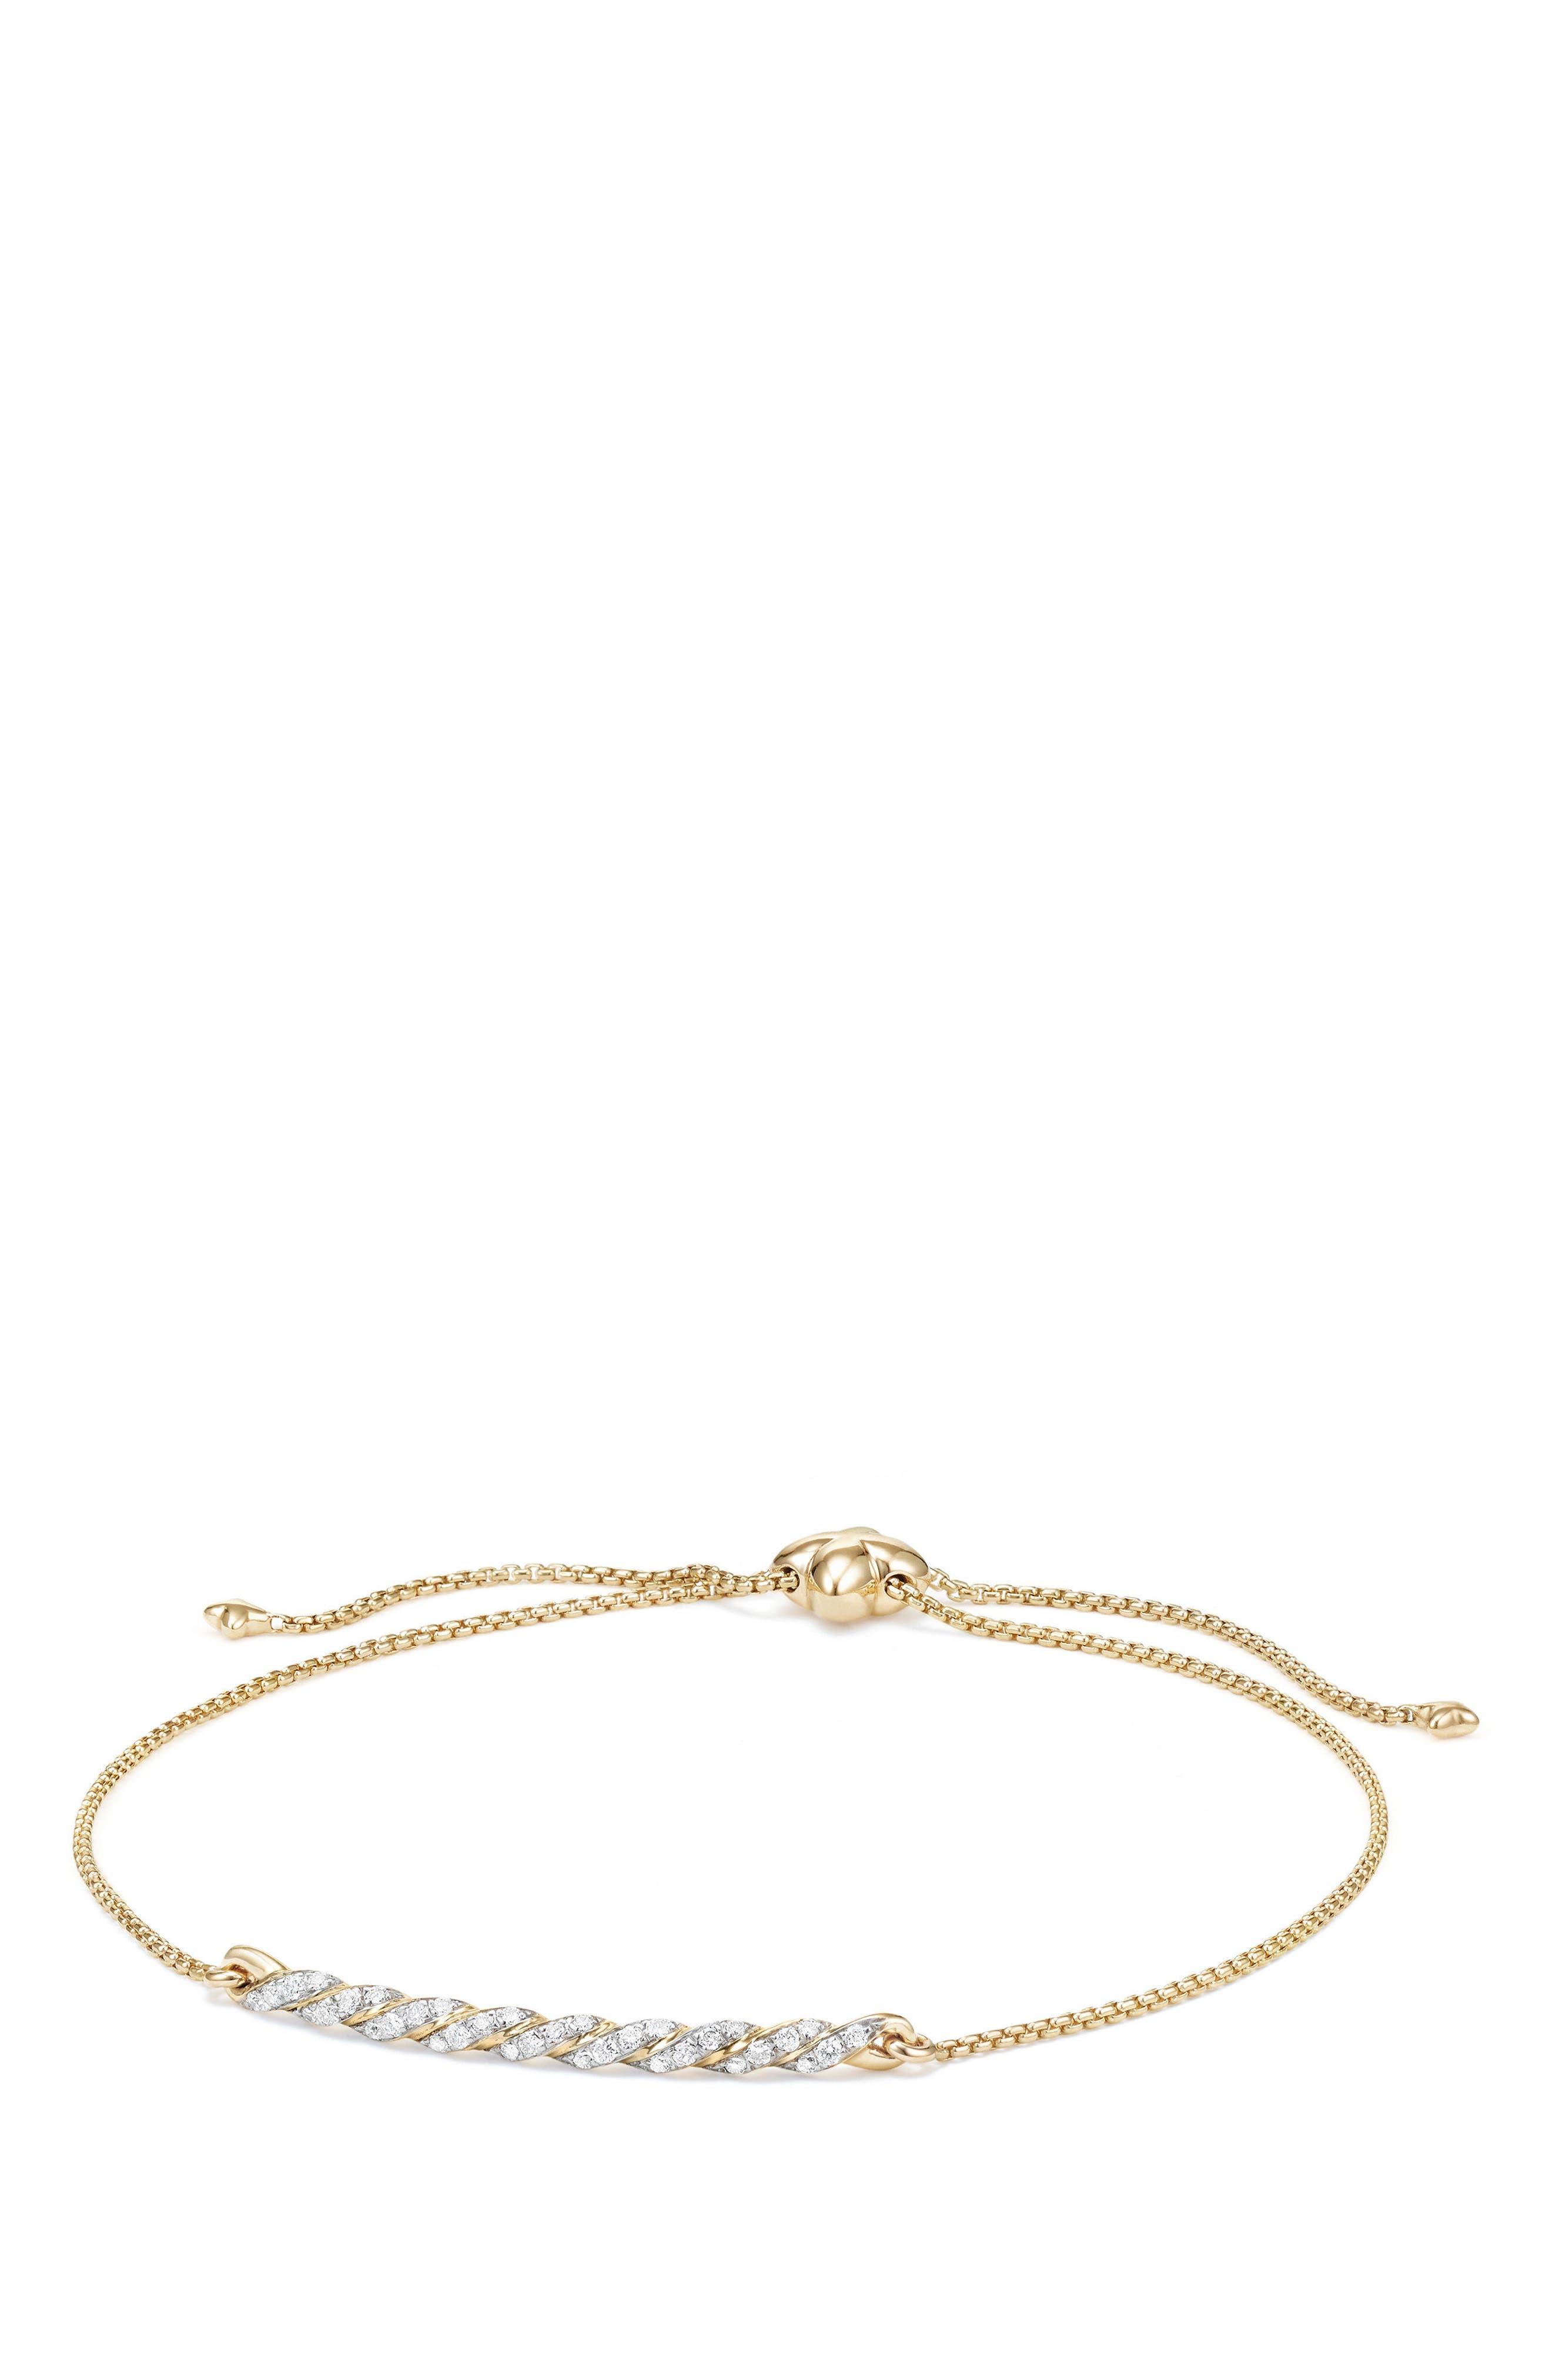 Paveflex Station Bracelet with Diamonds in 18K Gold,                         Main,                         color, Yellow Gold/ Diamond